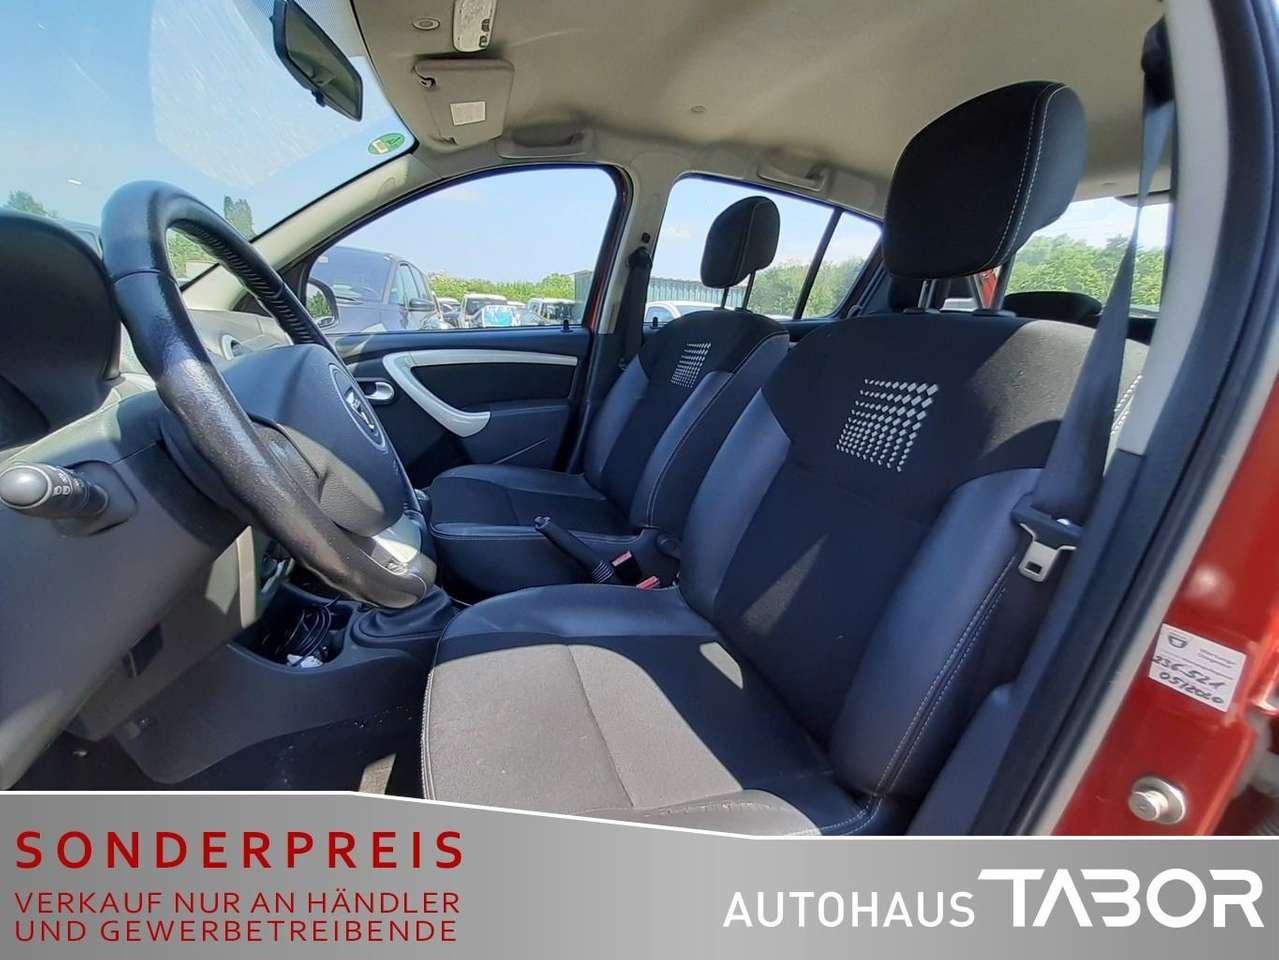 Autos nach Dacia Sandero